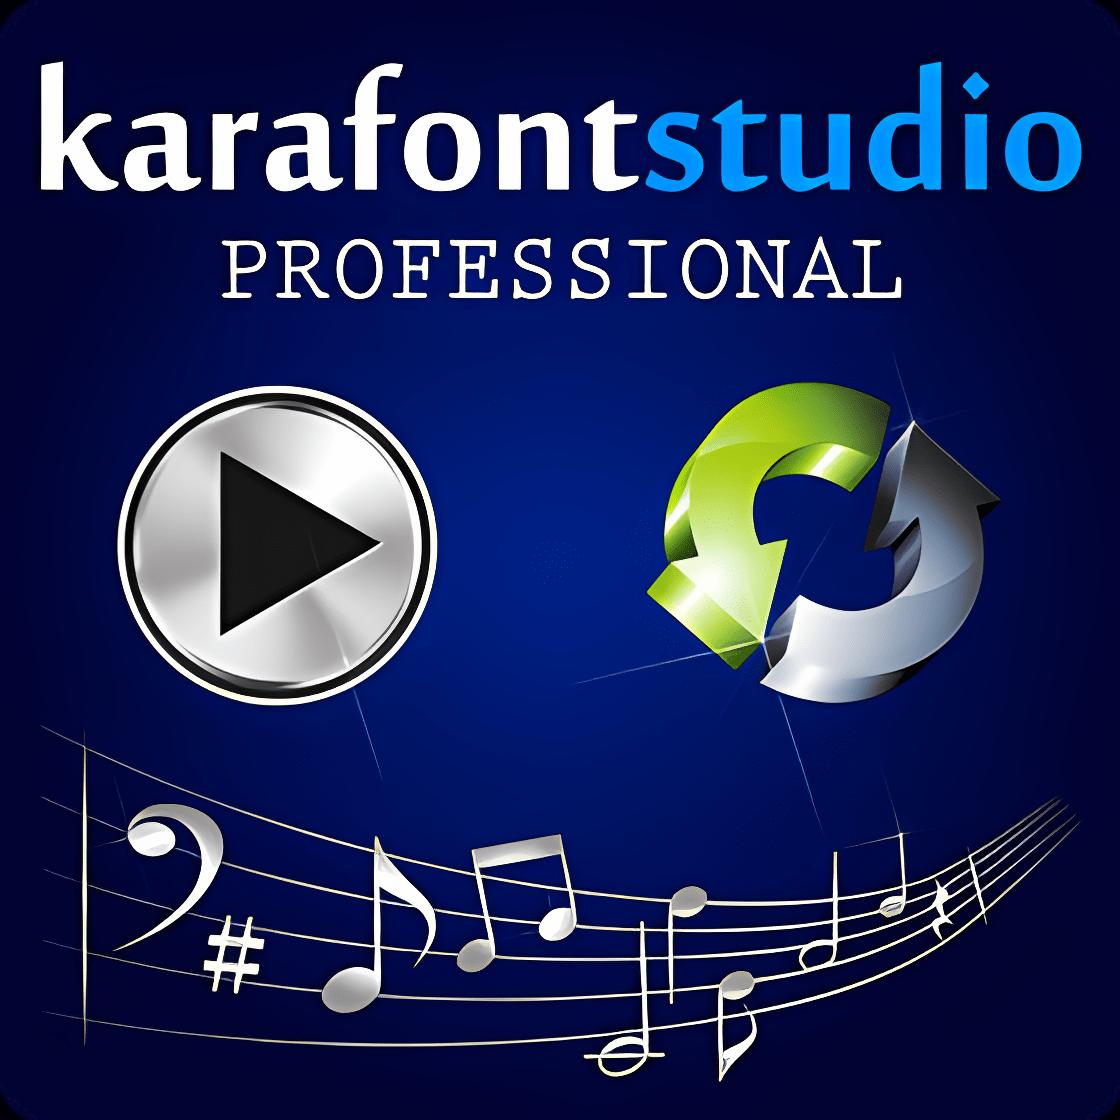 Karafont Studio Professional